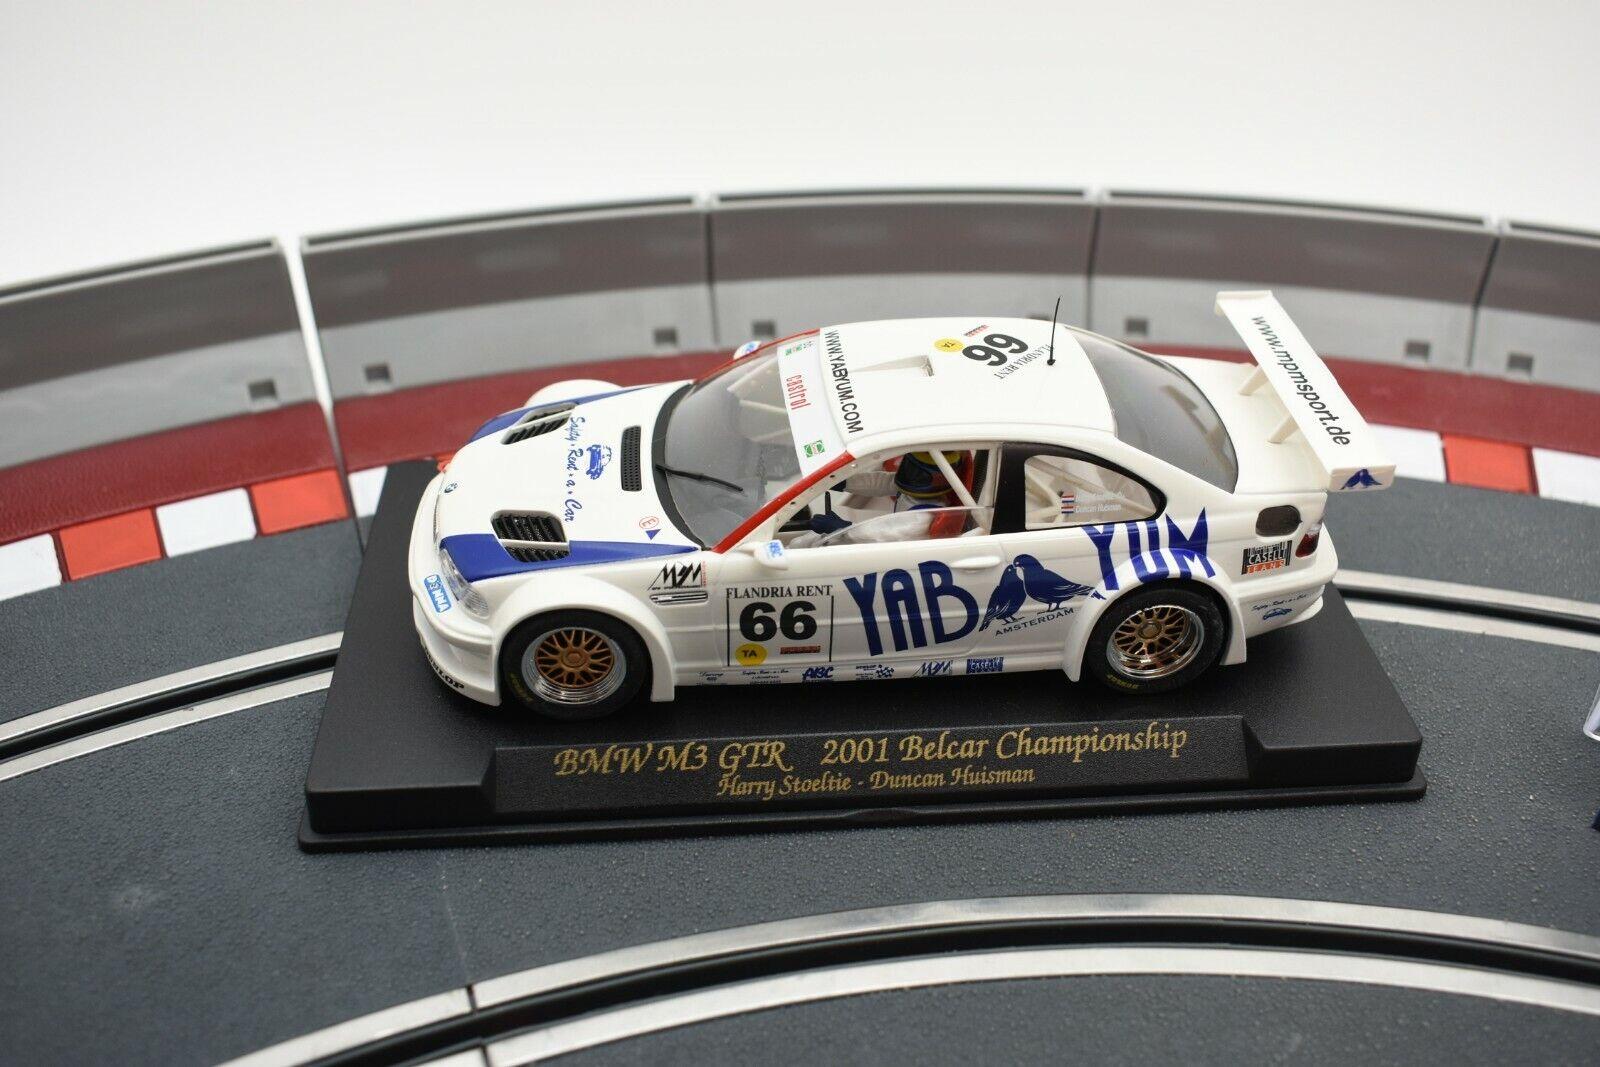 88013 FLY CAR MODELS 1 32 SLOT CARS BMW M3 GTR 2001 BELCAR CHAMPIONSHIP A 286